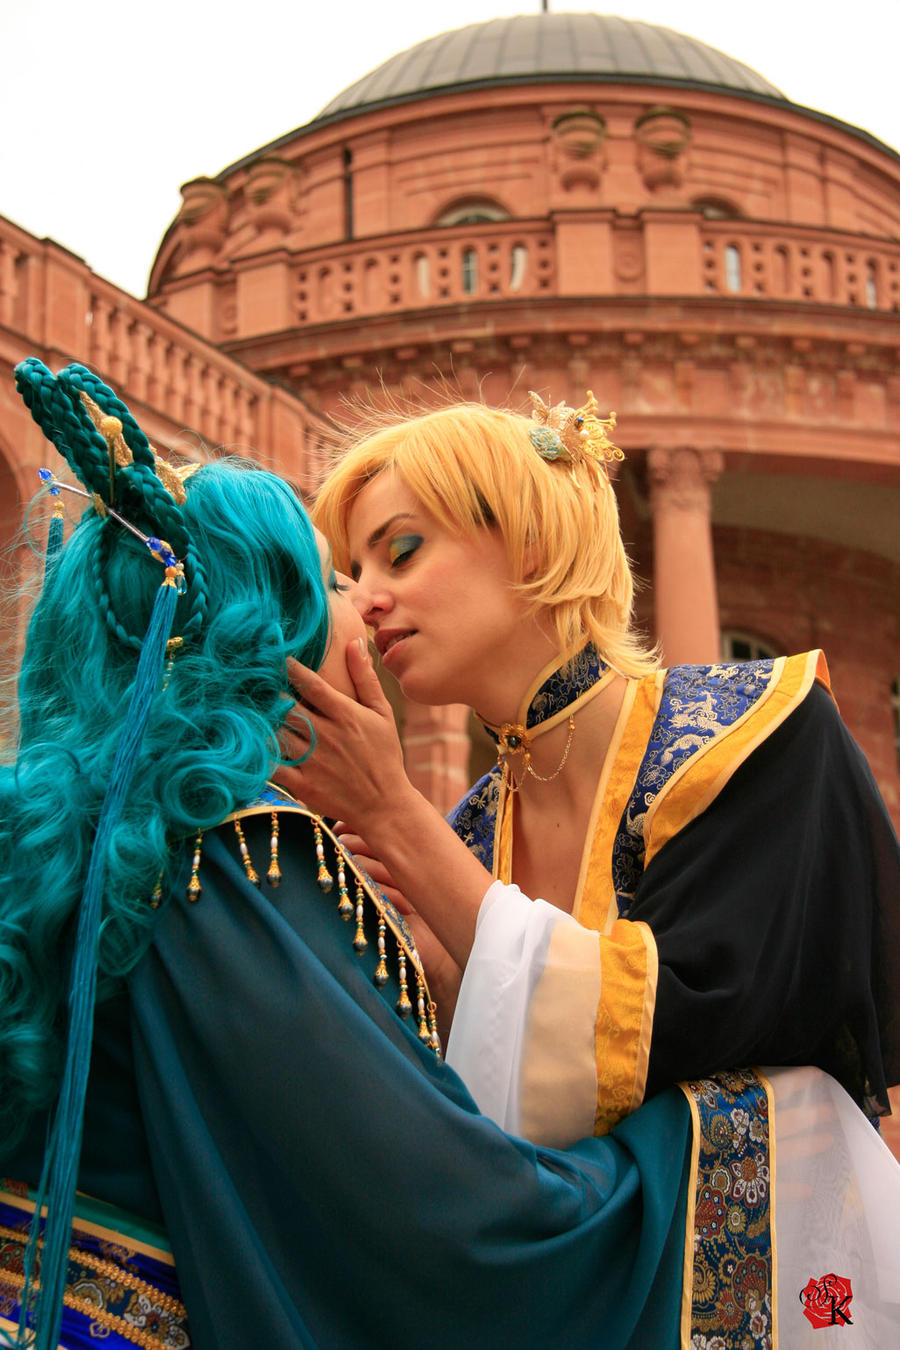 Her Majesty Romance by SezuCosplay